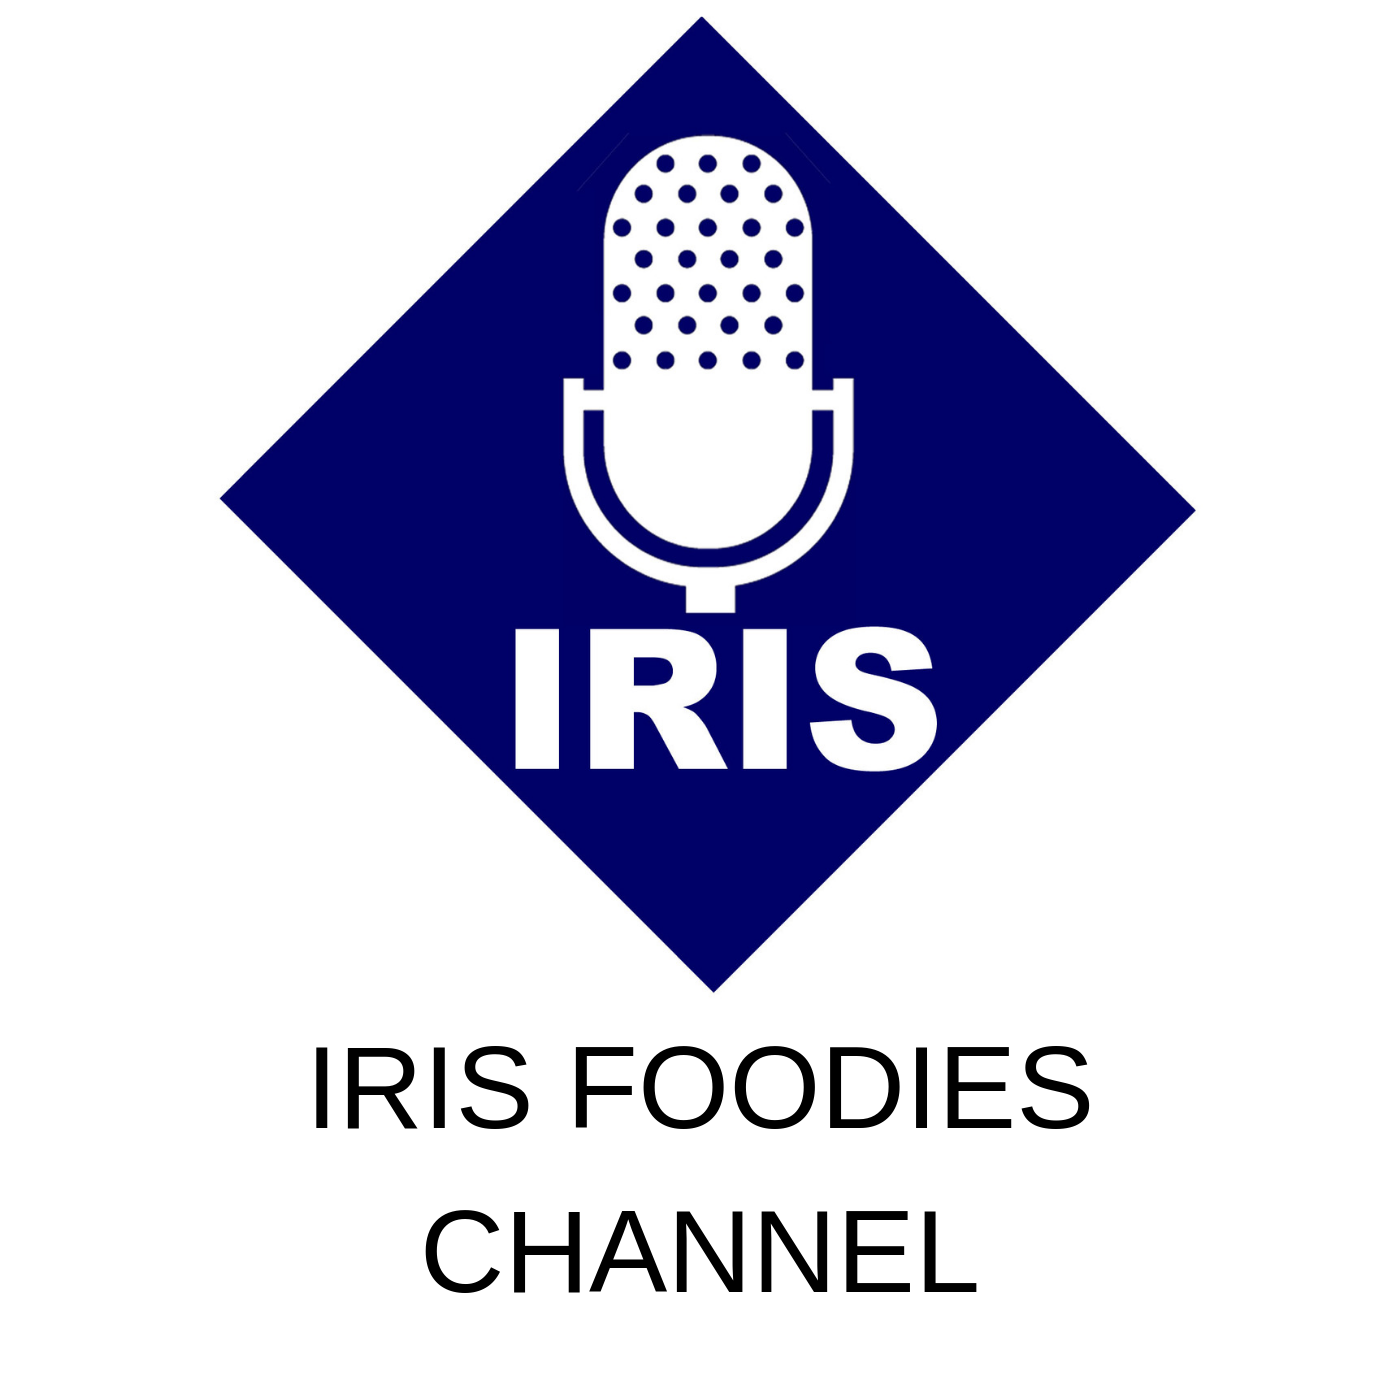 IRIS Foodies